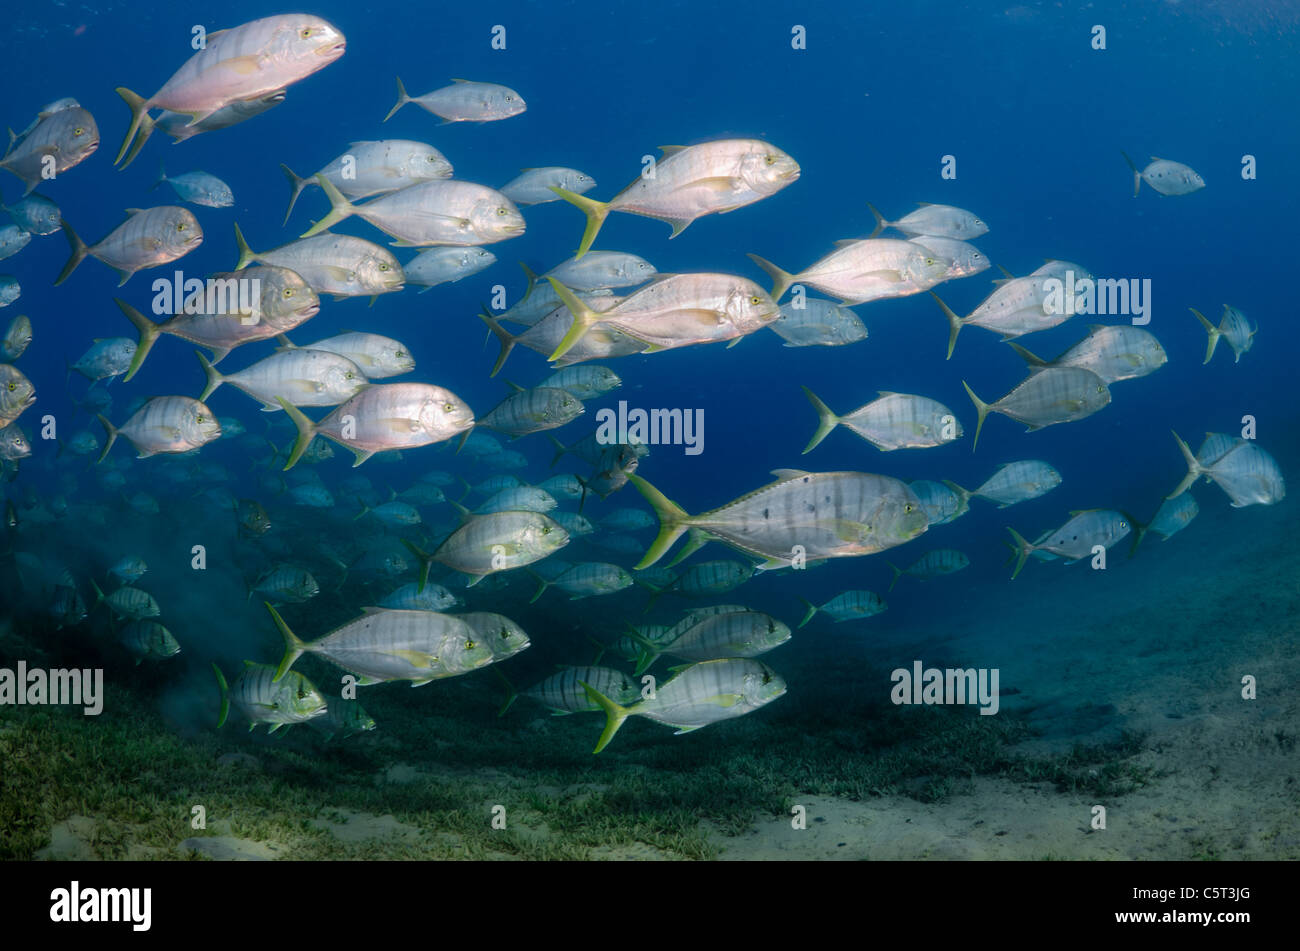 School of jack fish or trevally, Nuweiba, Red Sea, Sinai, Egypt - Stock Image